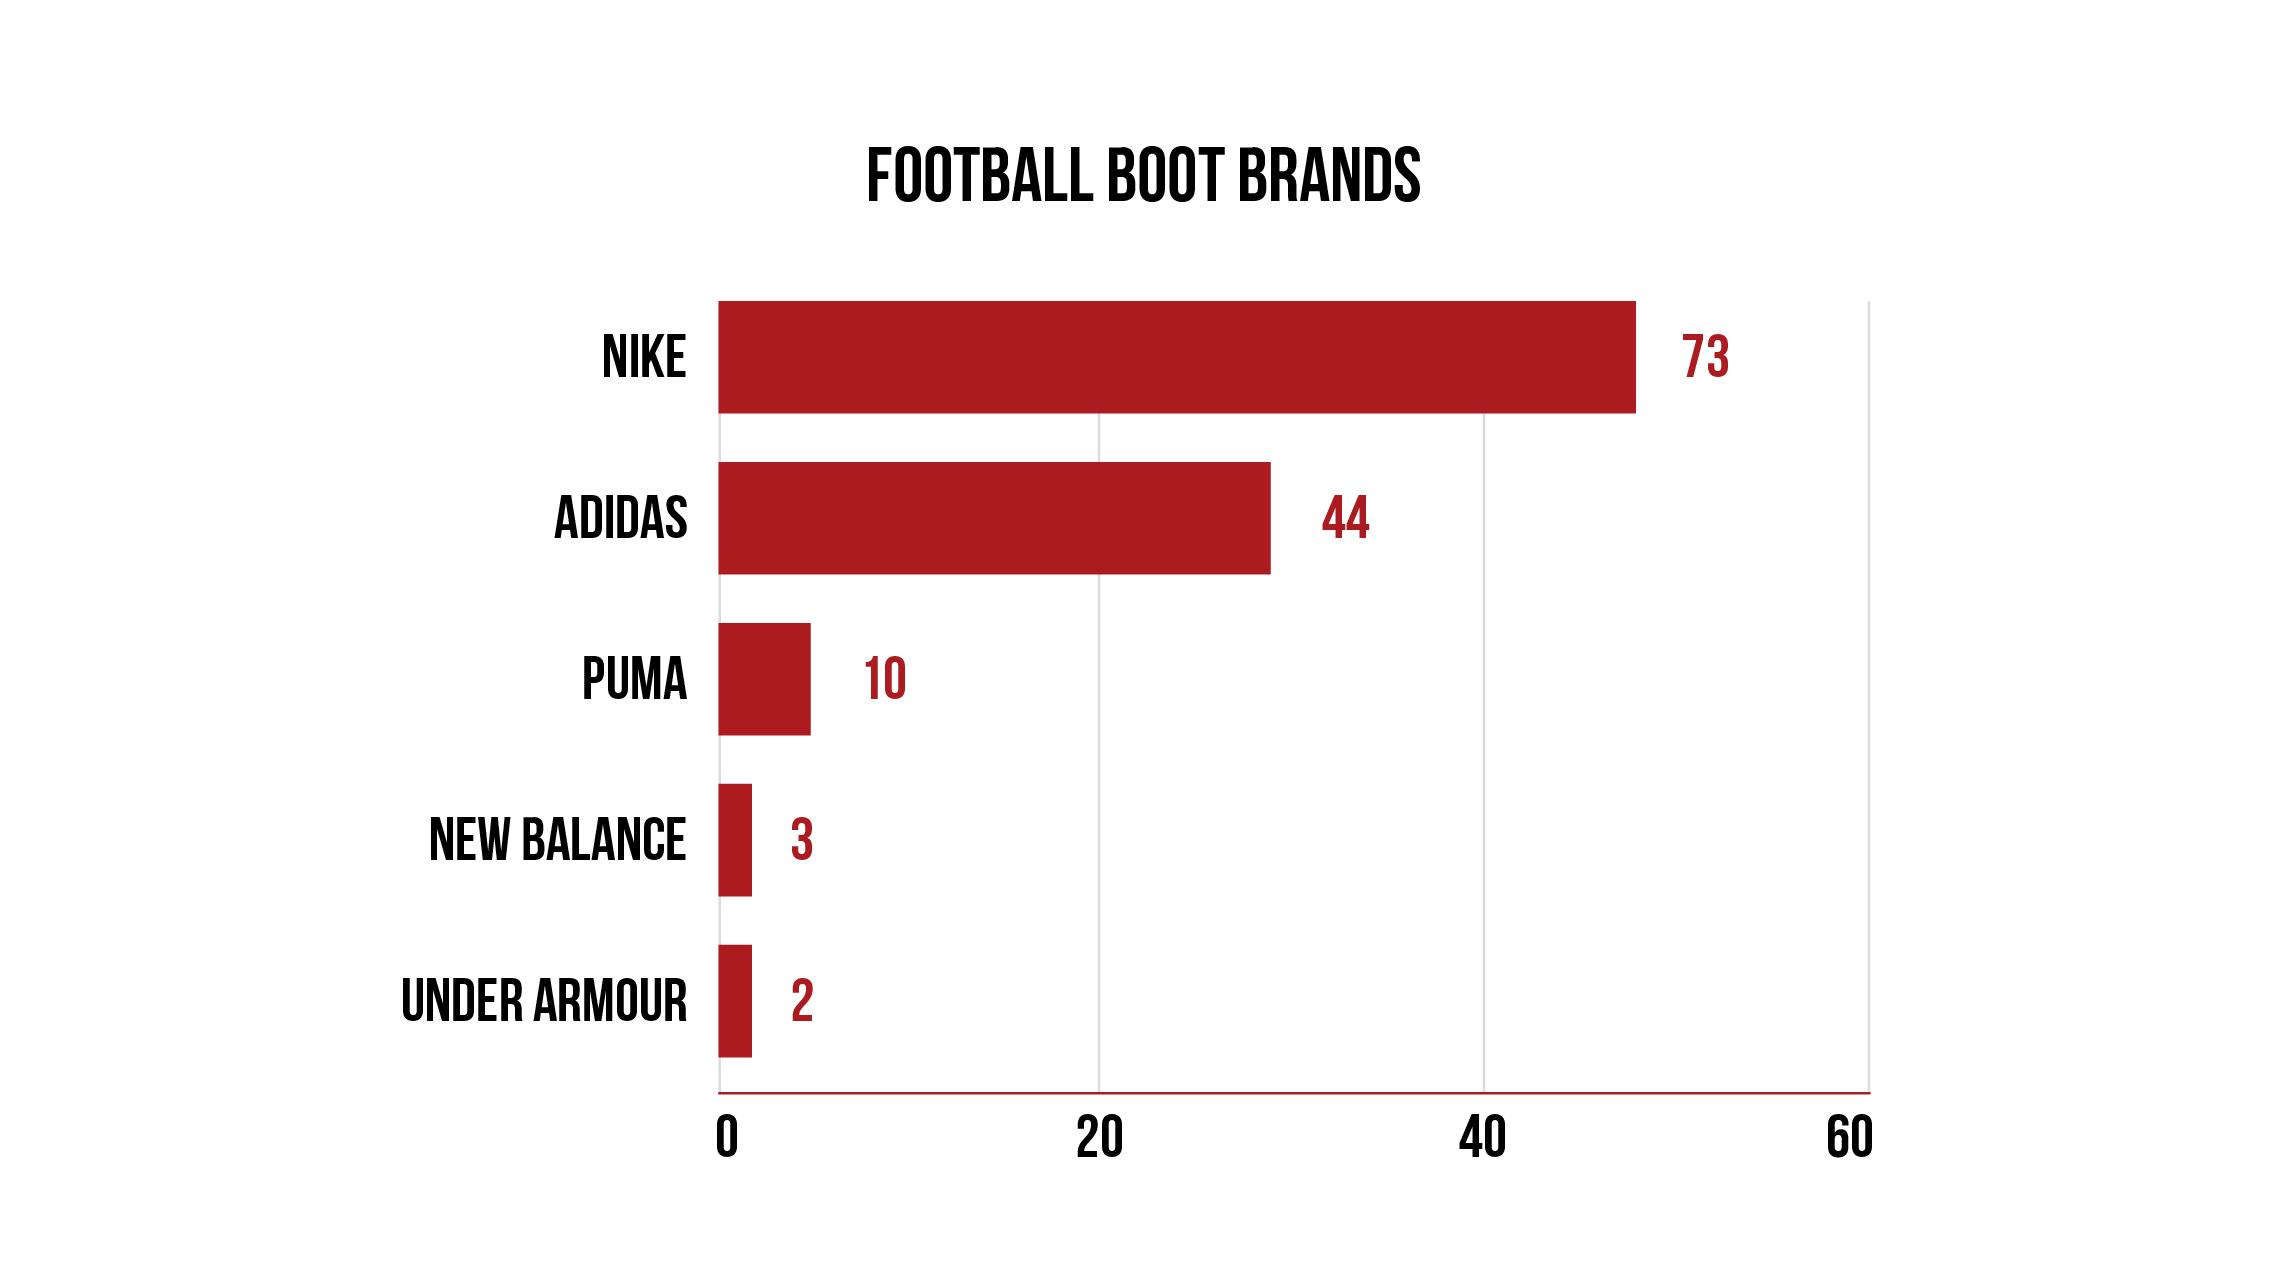 Brand goals scored